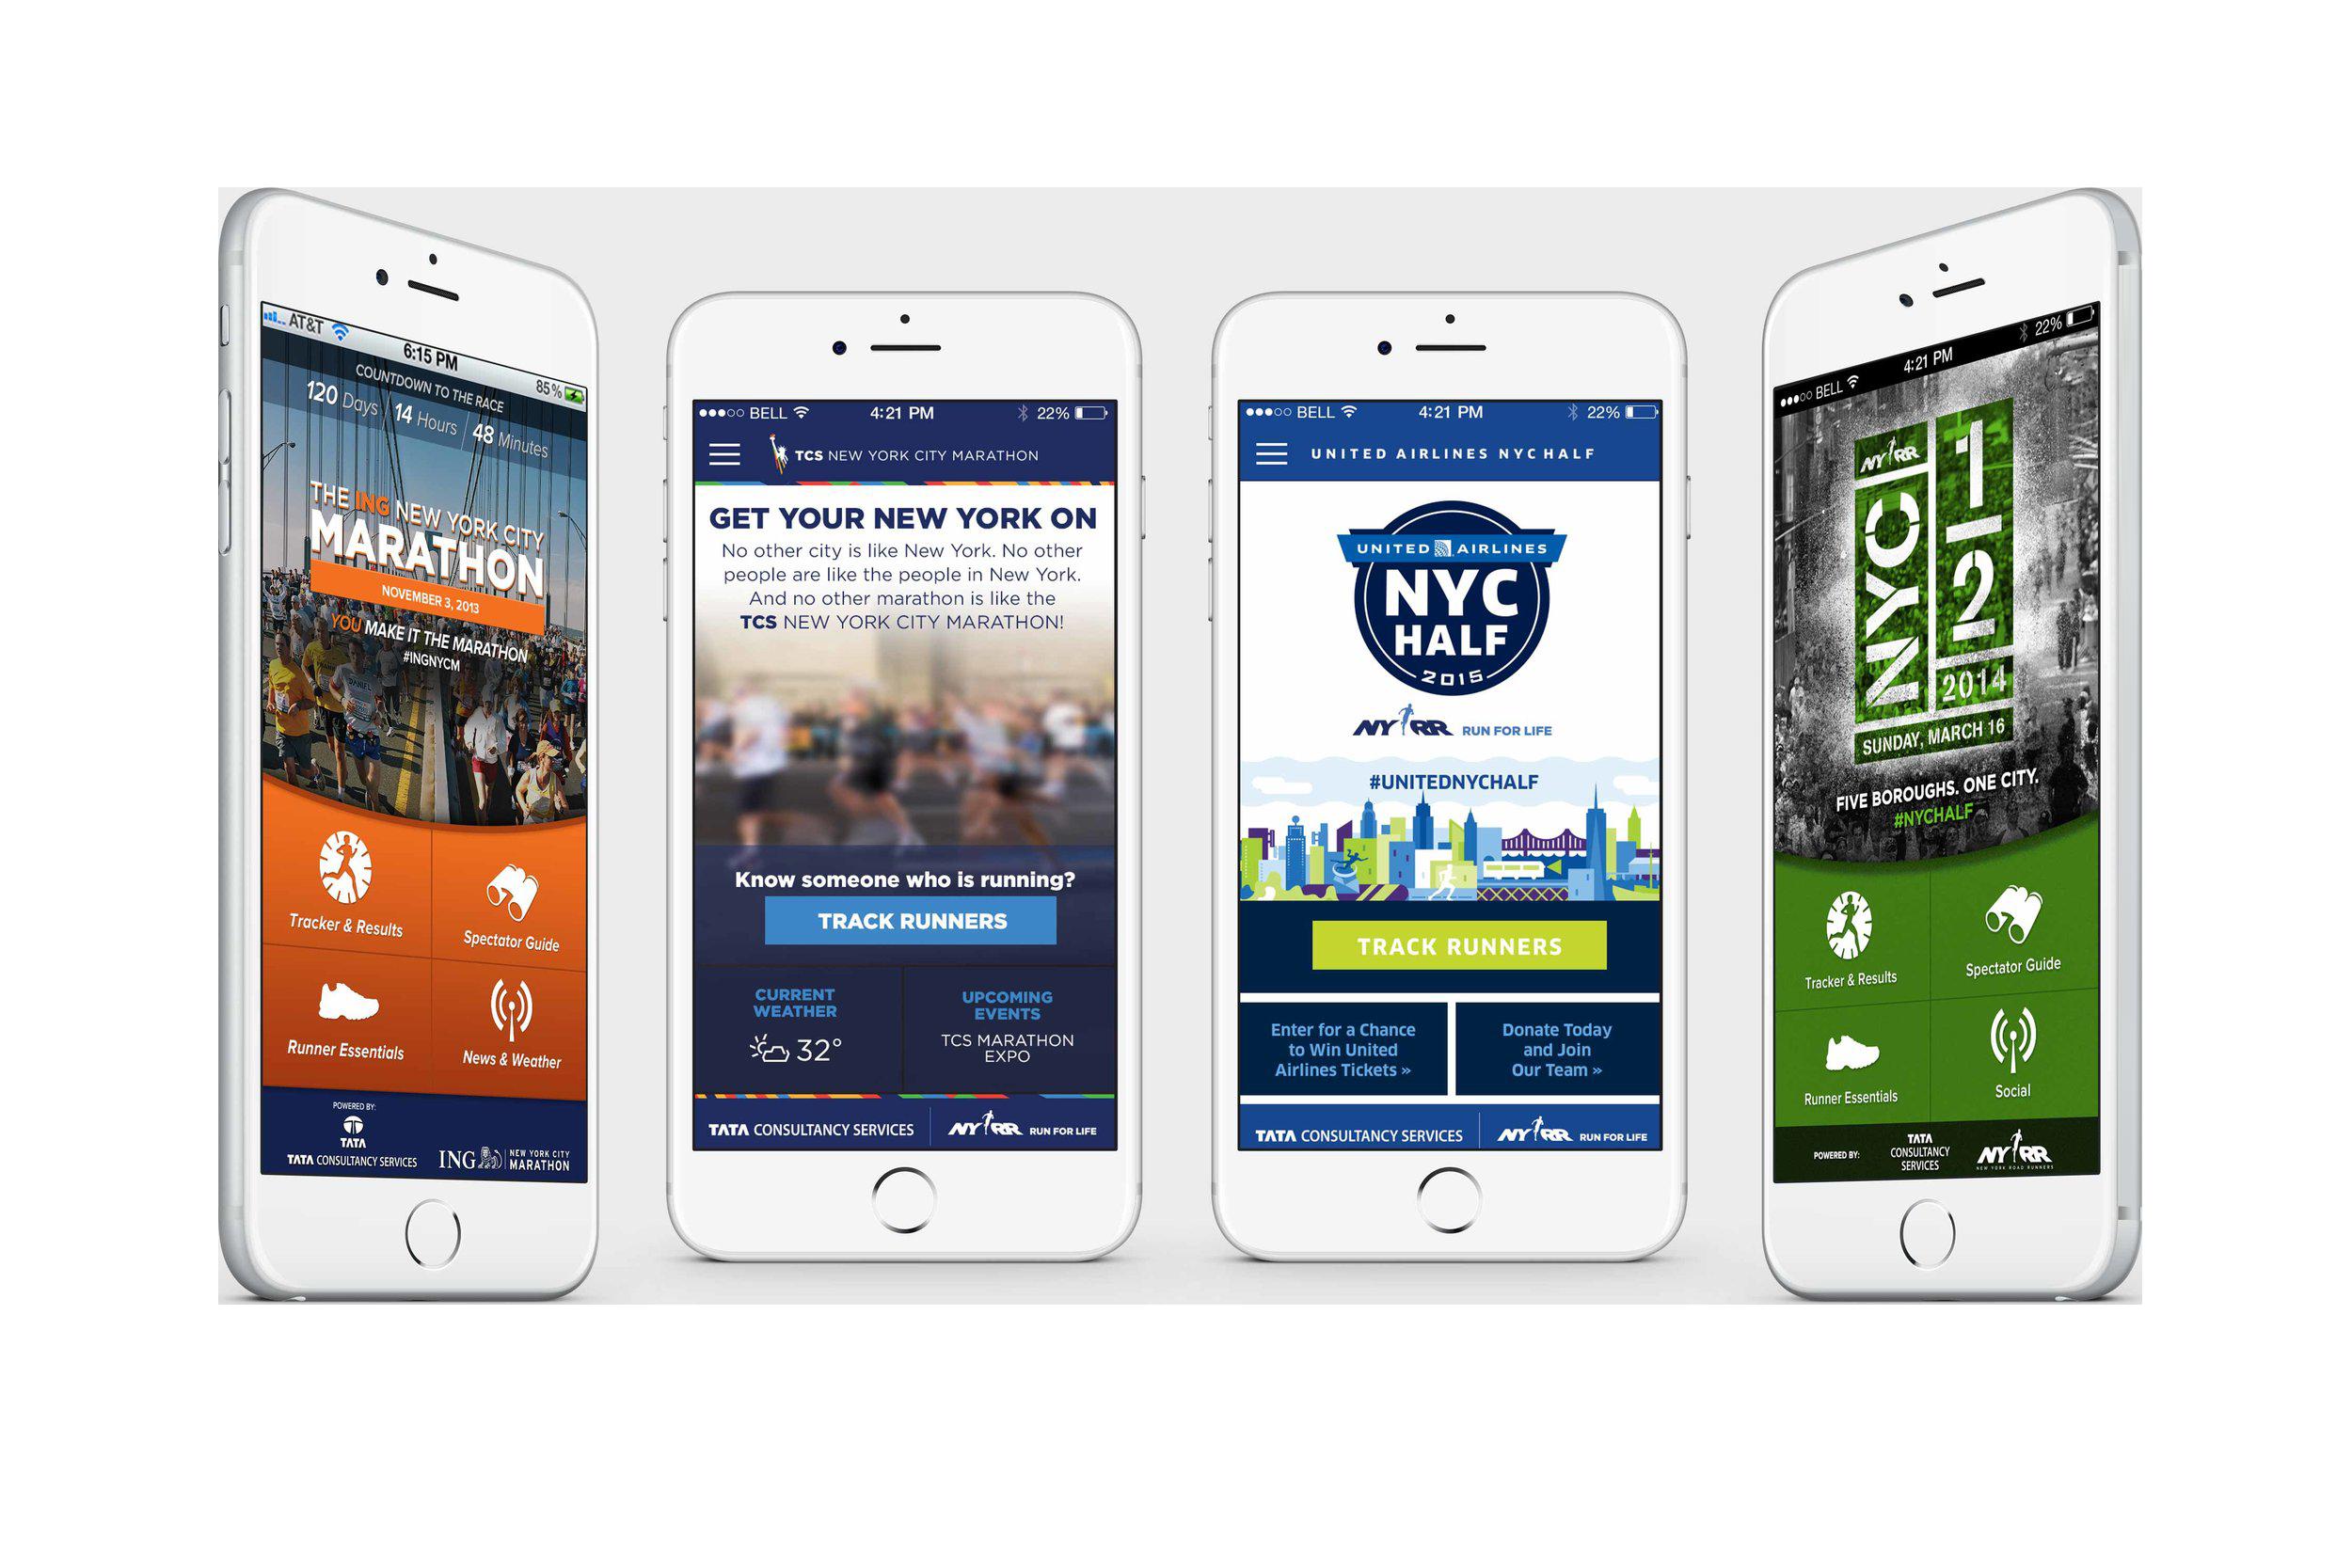 NYC Marathon App Porfolio - Mobile app designs for the NYC Half and Full Marathons